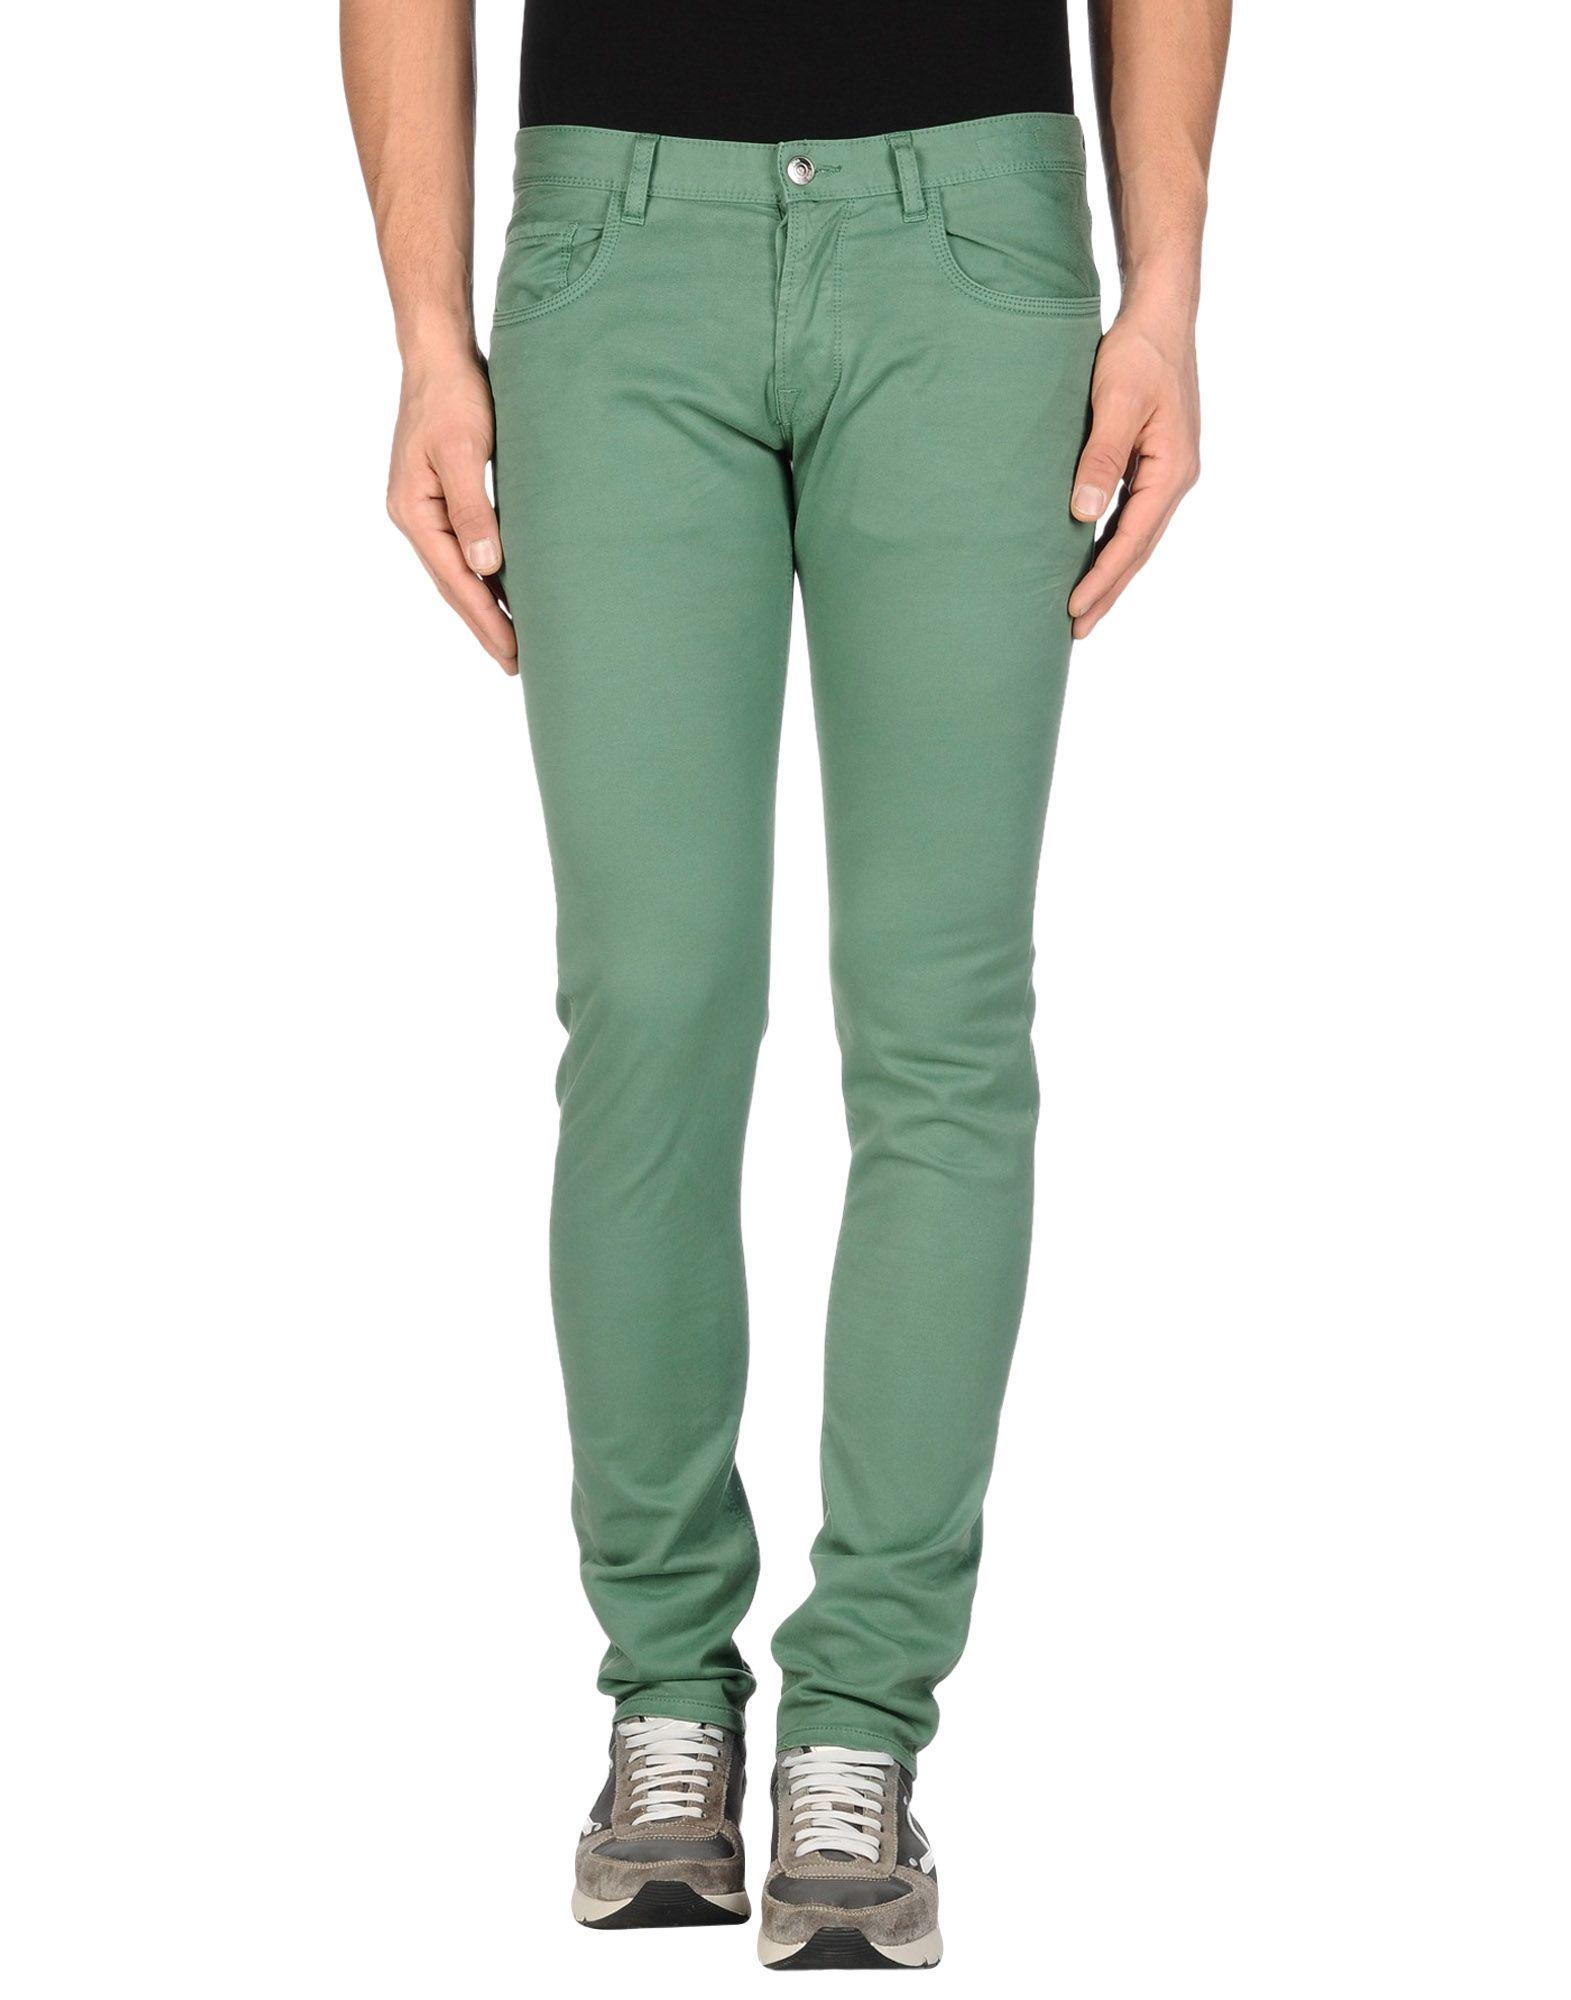 PATRIZIA PEPE Джинсовые брюки patrizia pepe джинсы крой дудочки